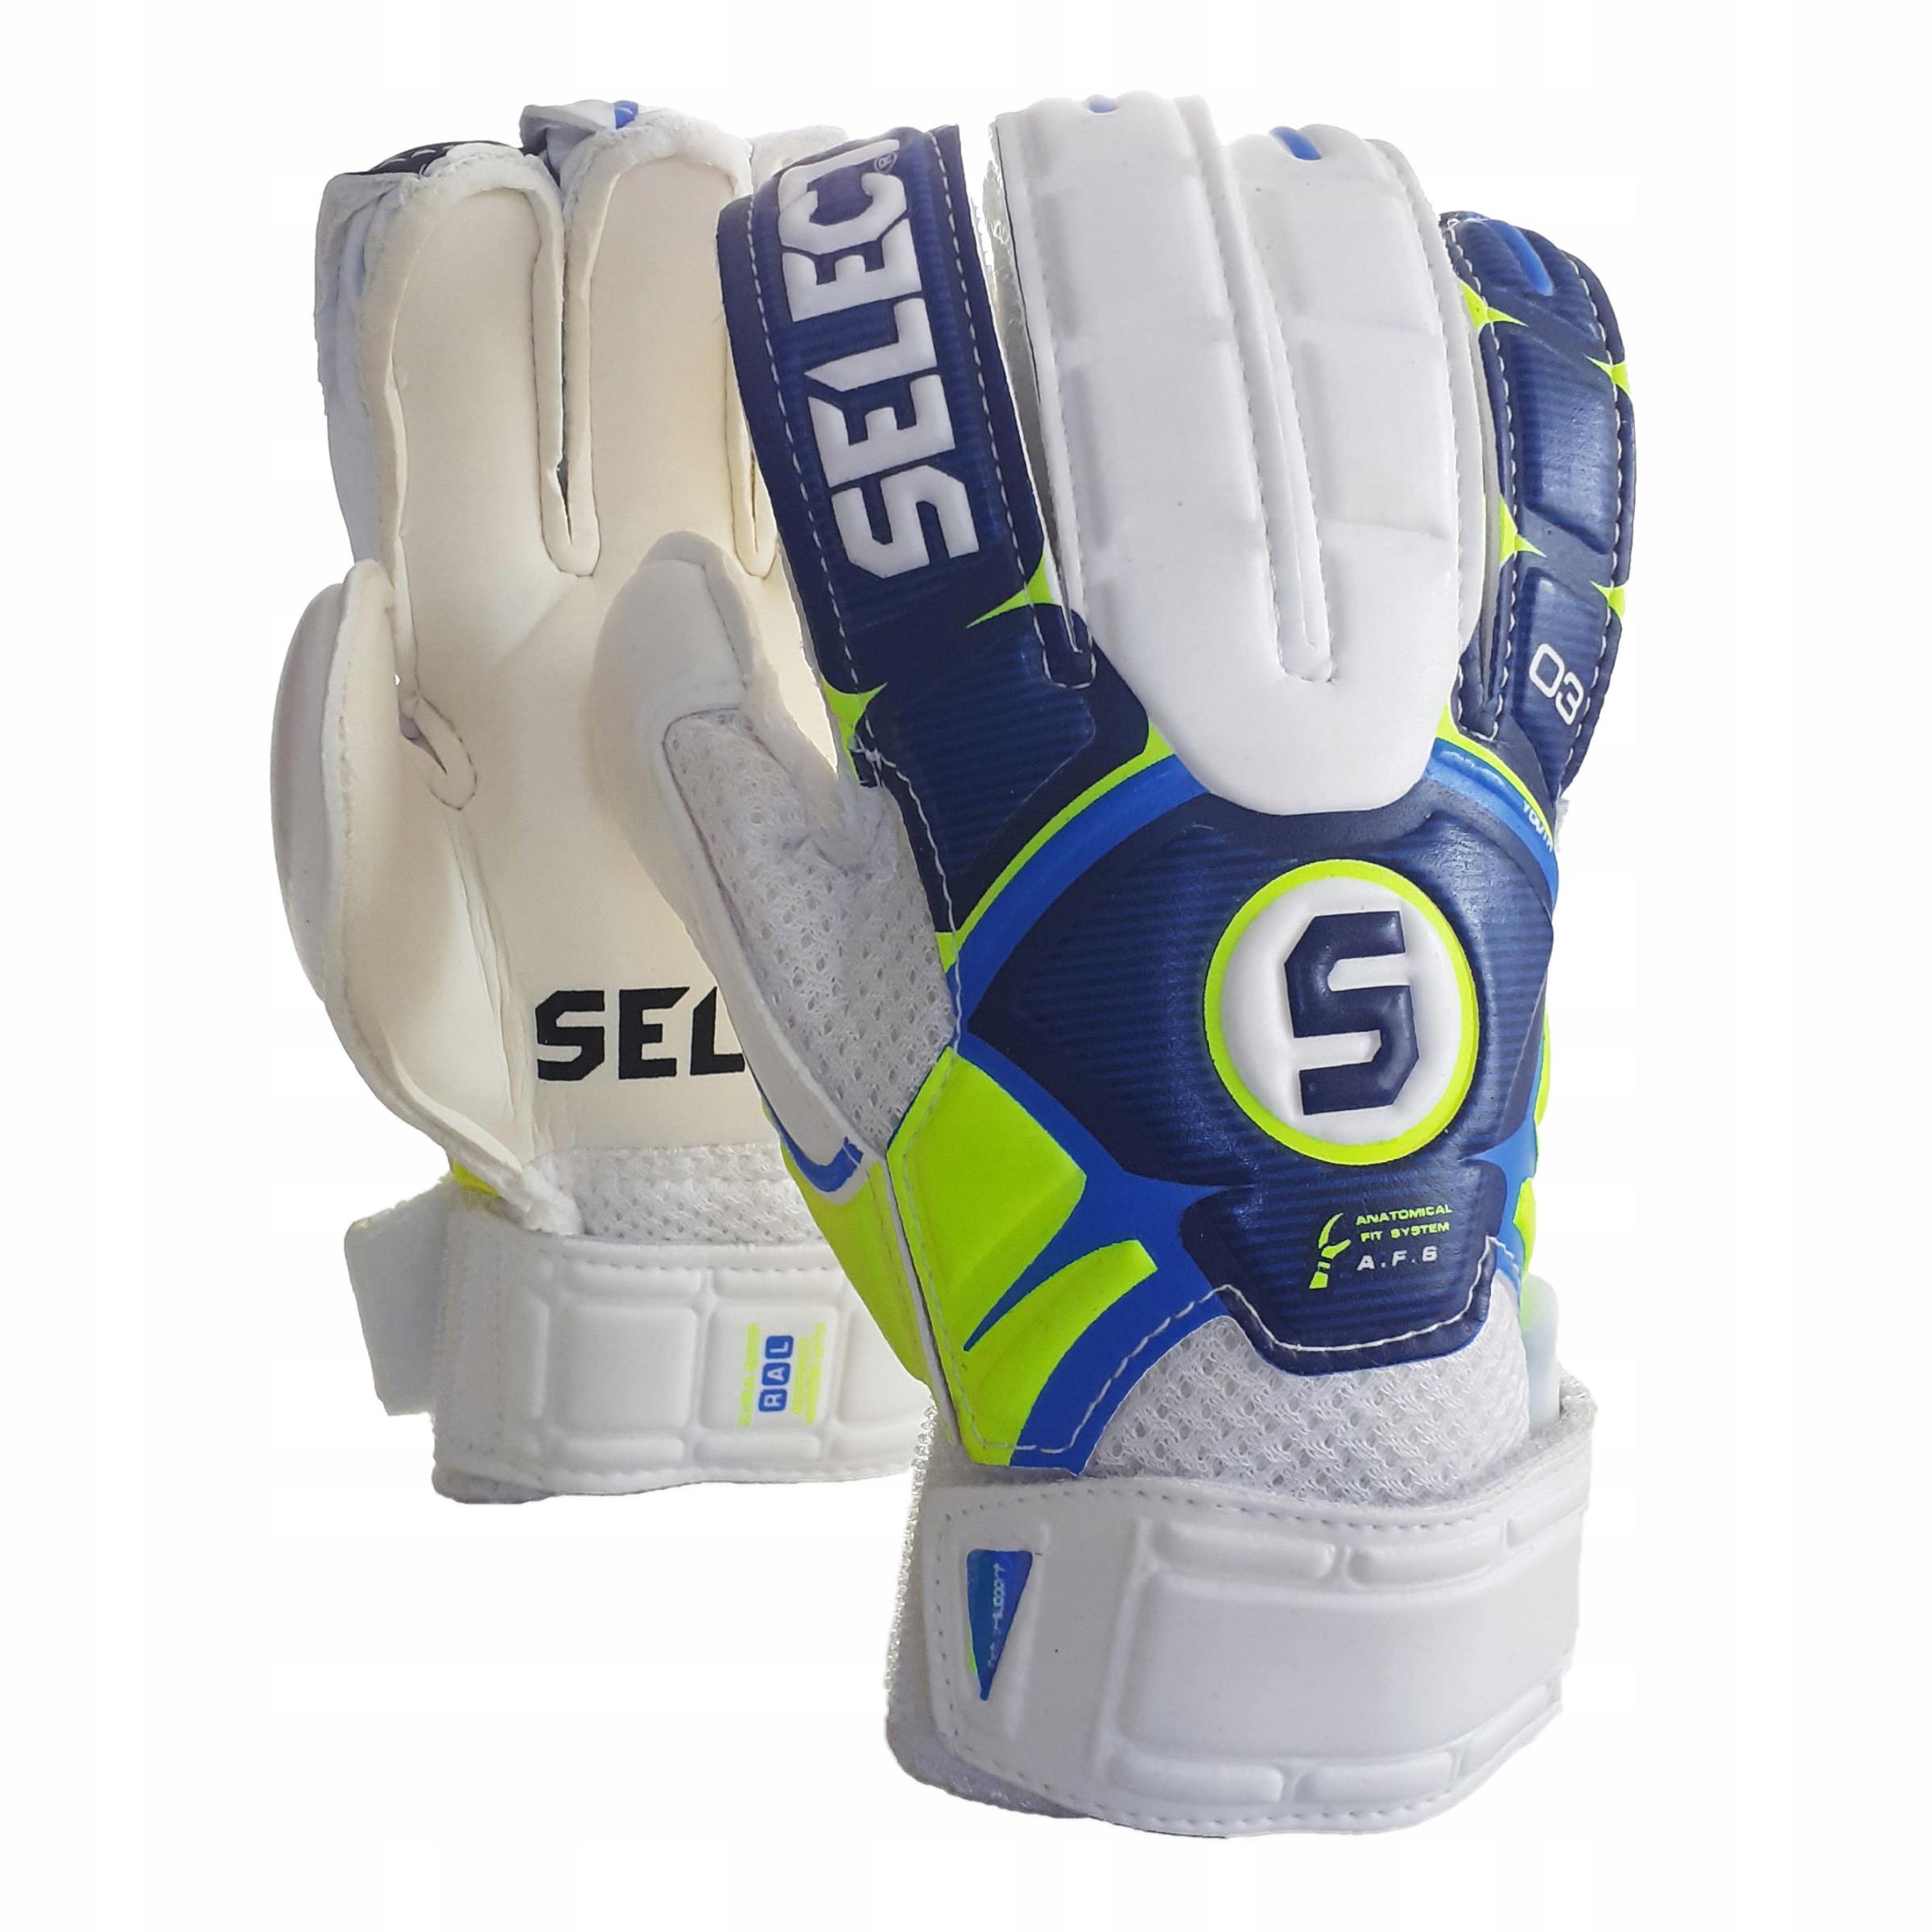 Перчатки вратаря SELECT 1 для Младший